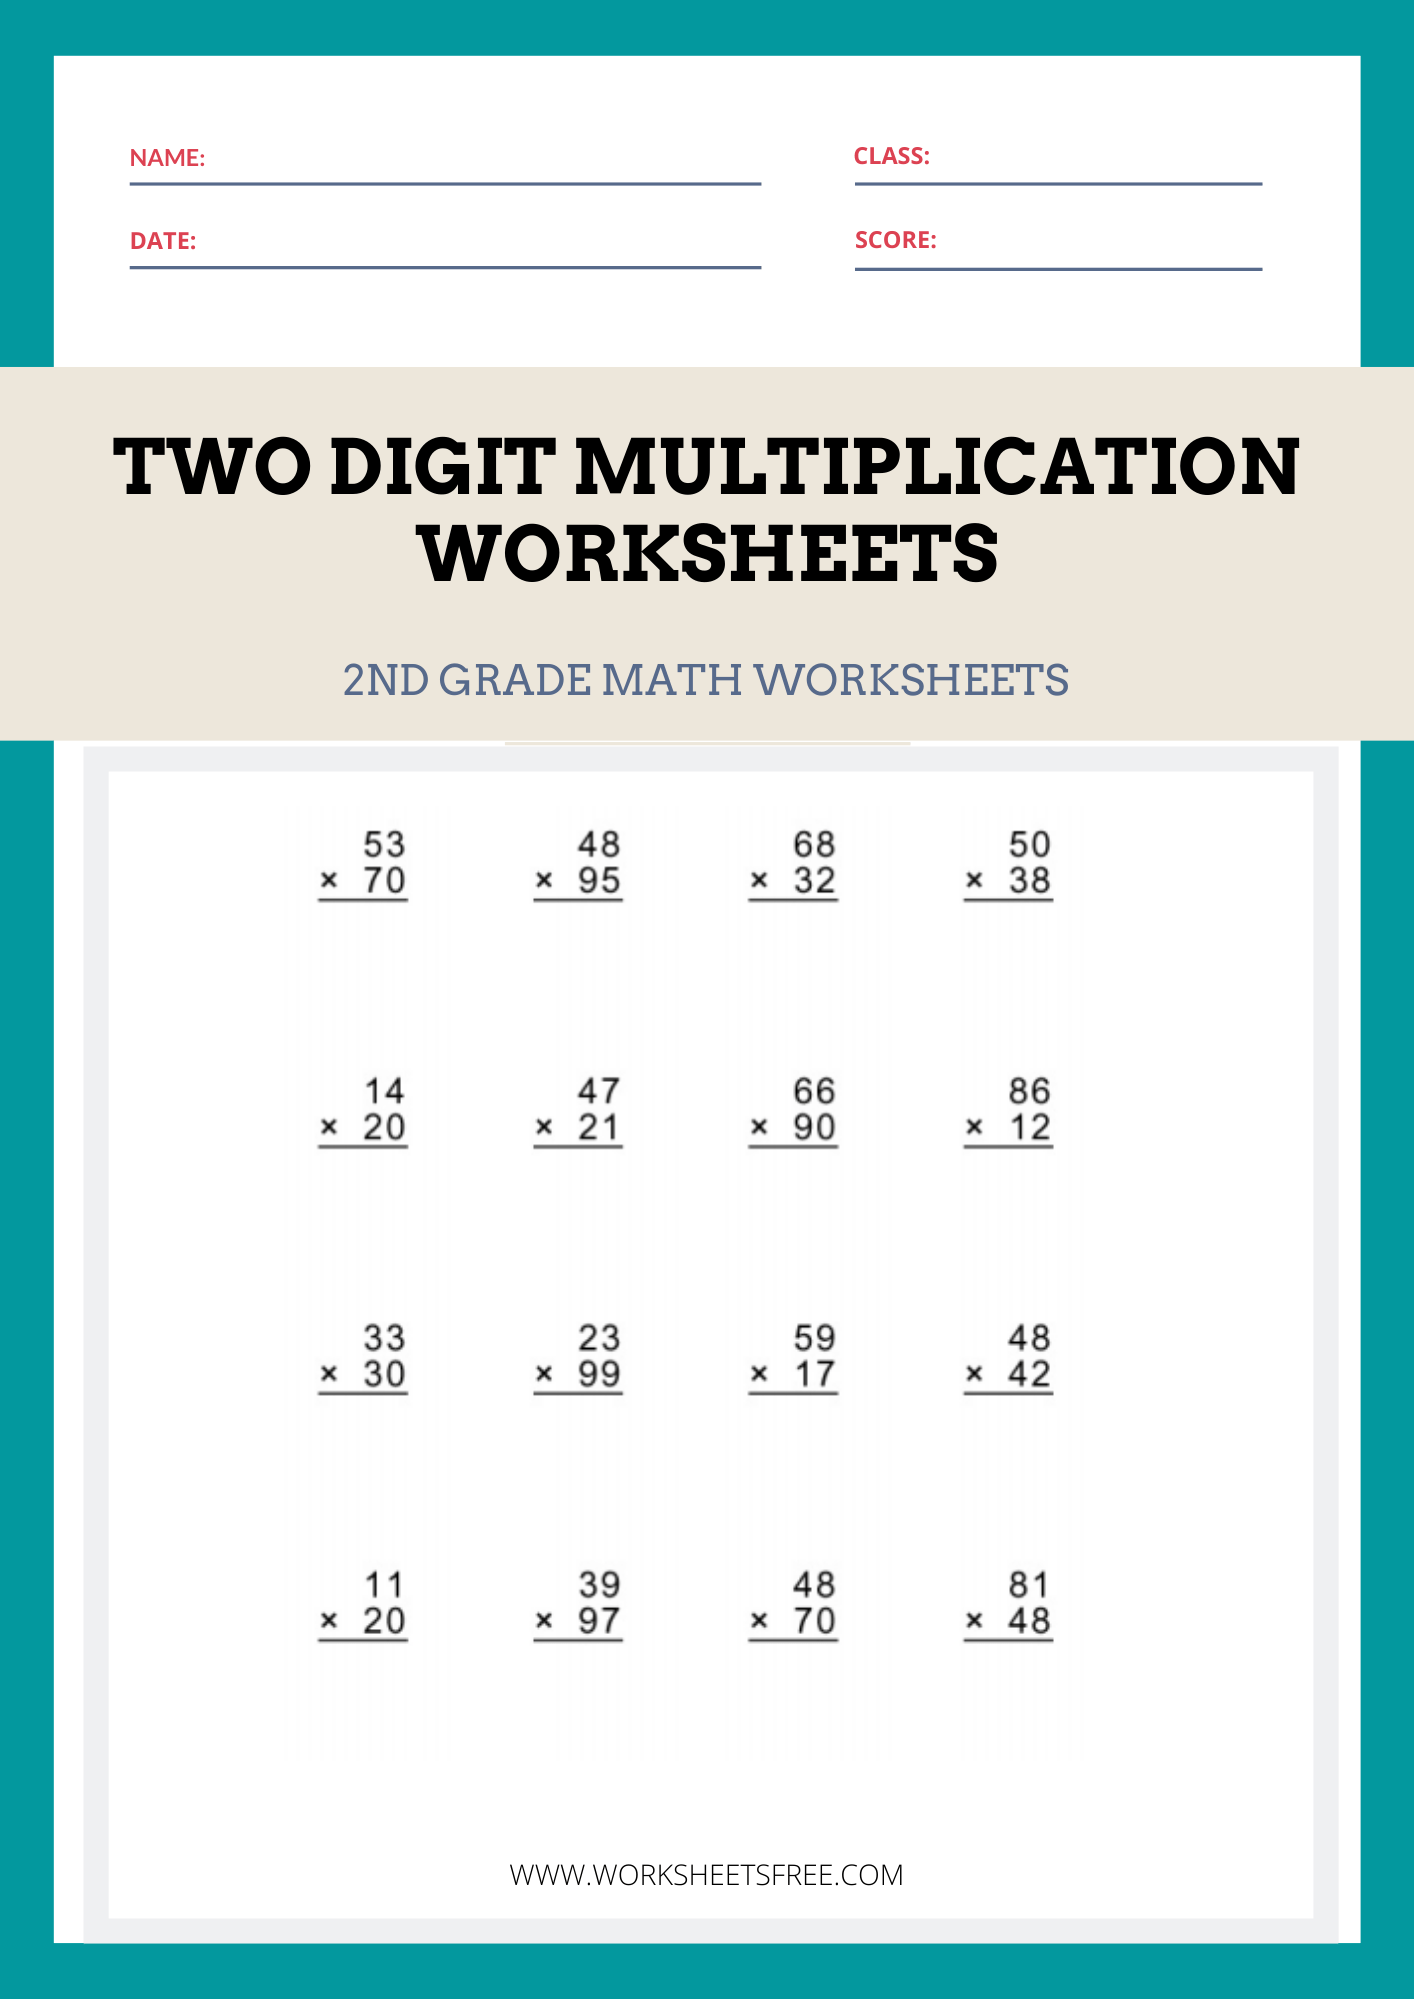 Two-Digit-Multiplication-Worksheets   Worksheets Free [ 2000 x 1414 Pixel ]